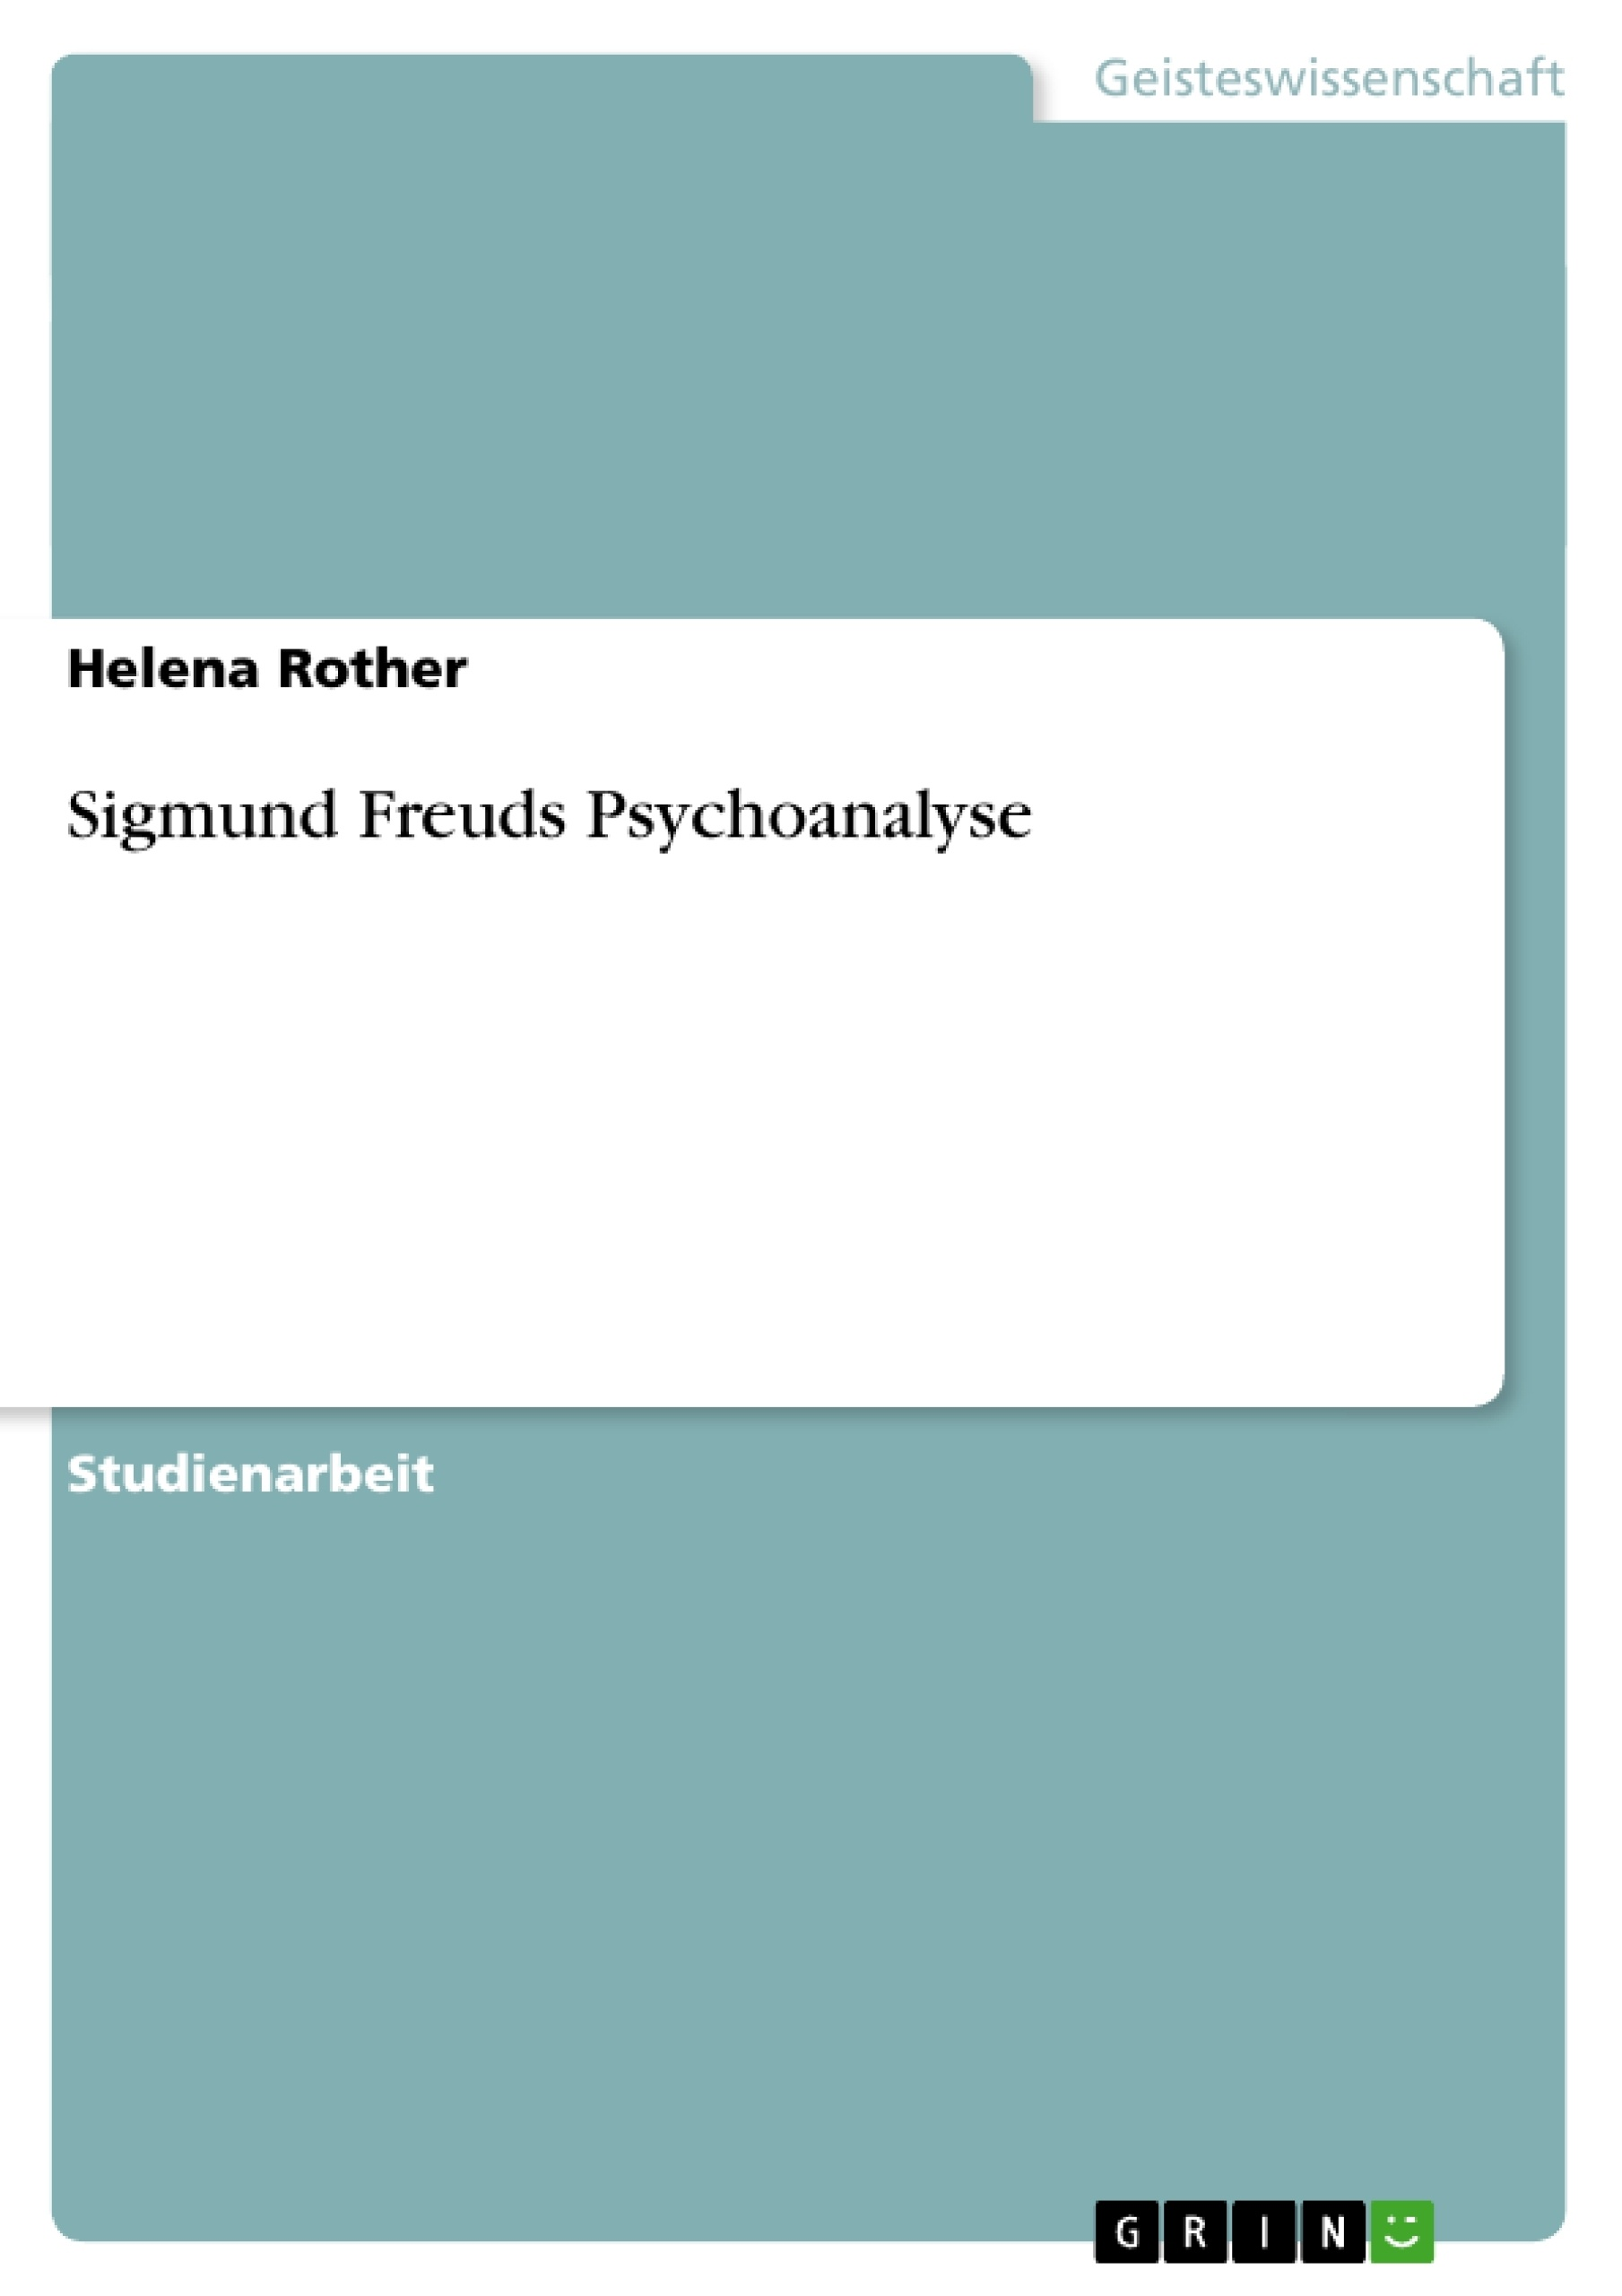 Titel: Sigmund Freuds Psychoanalyse